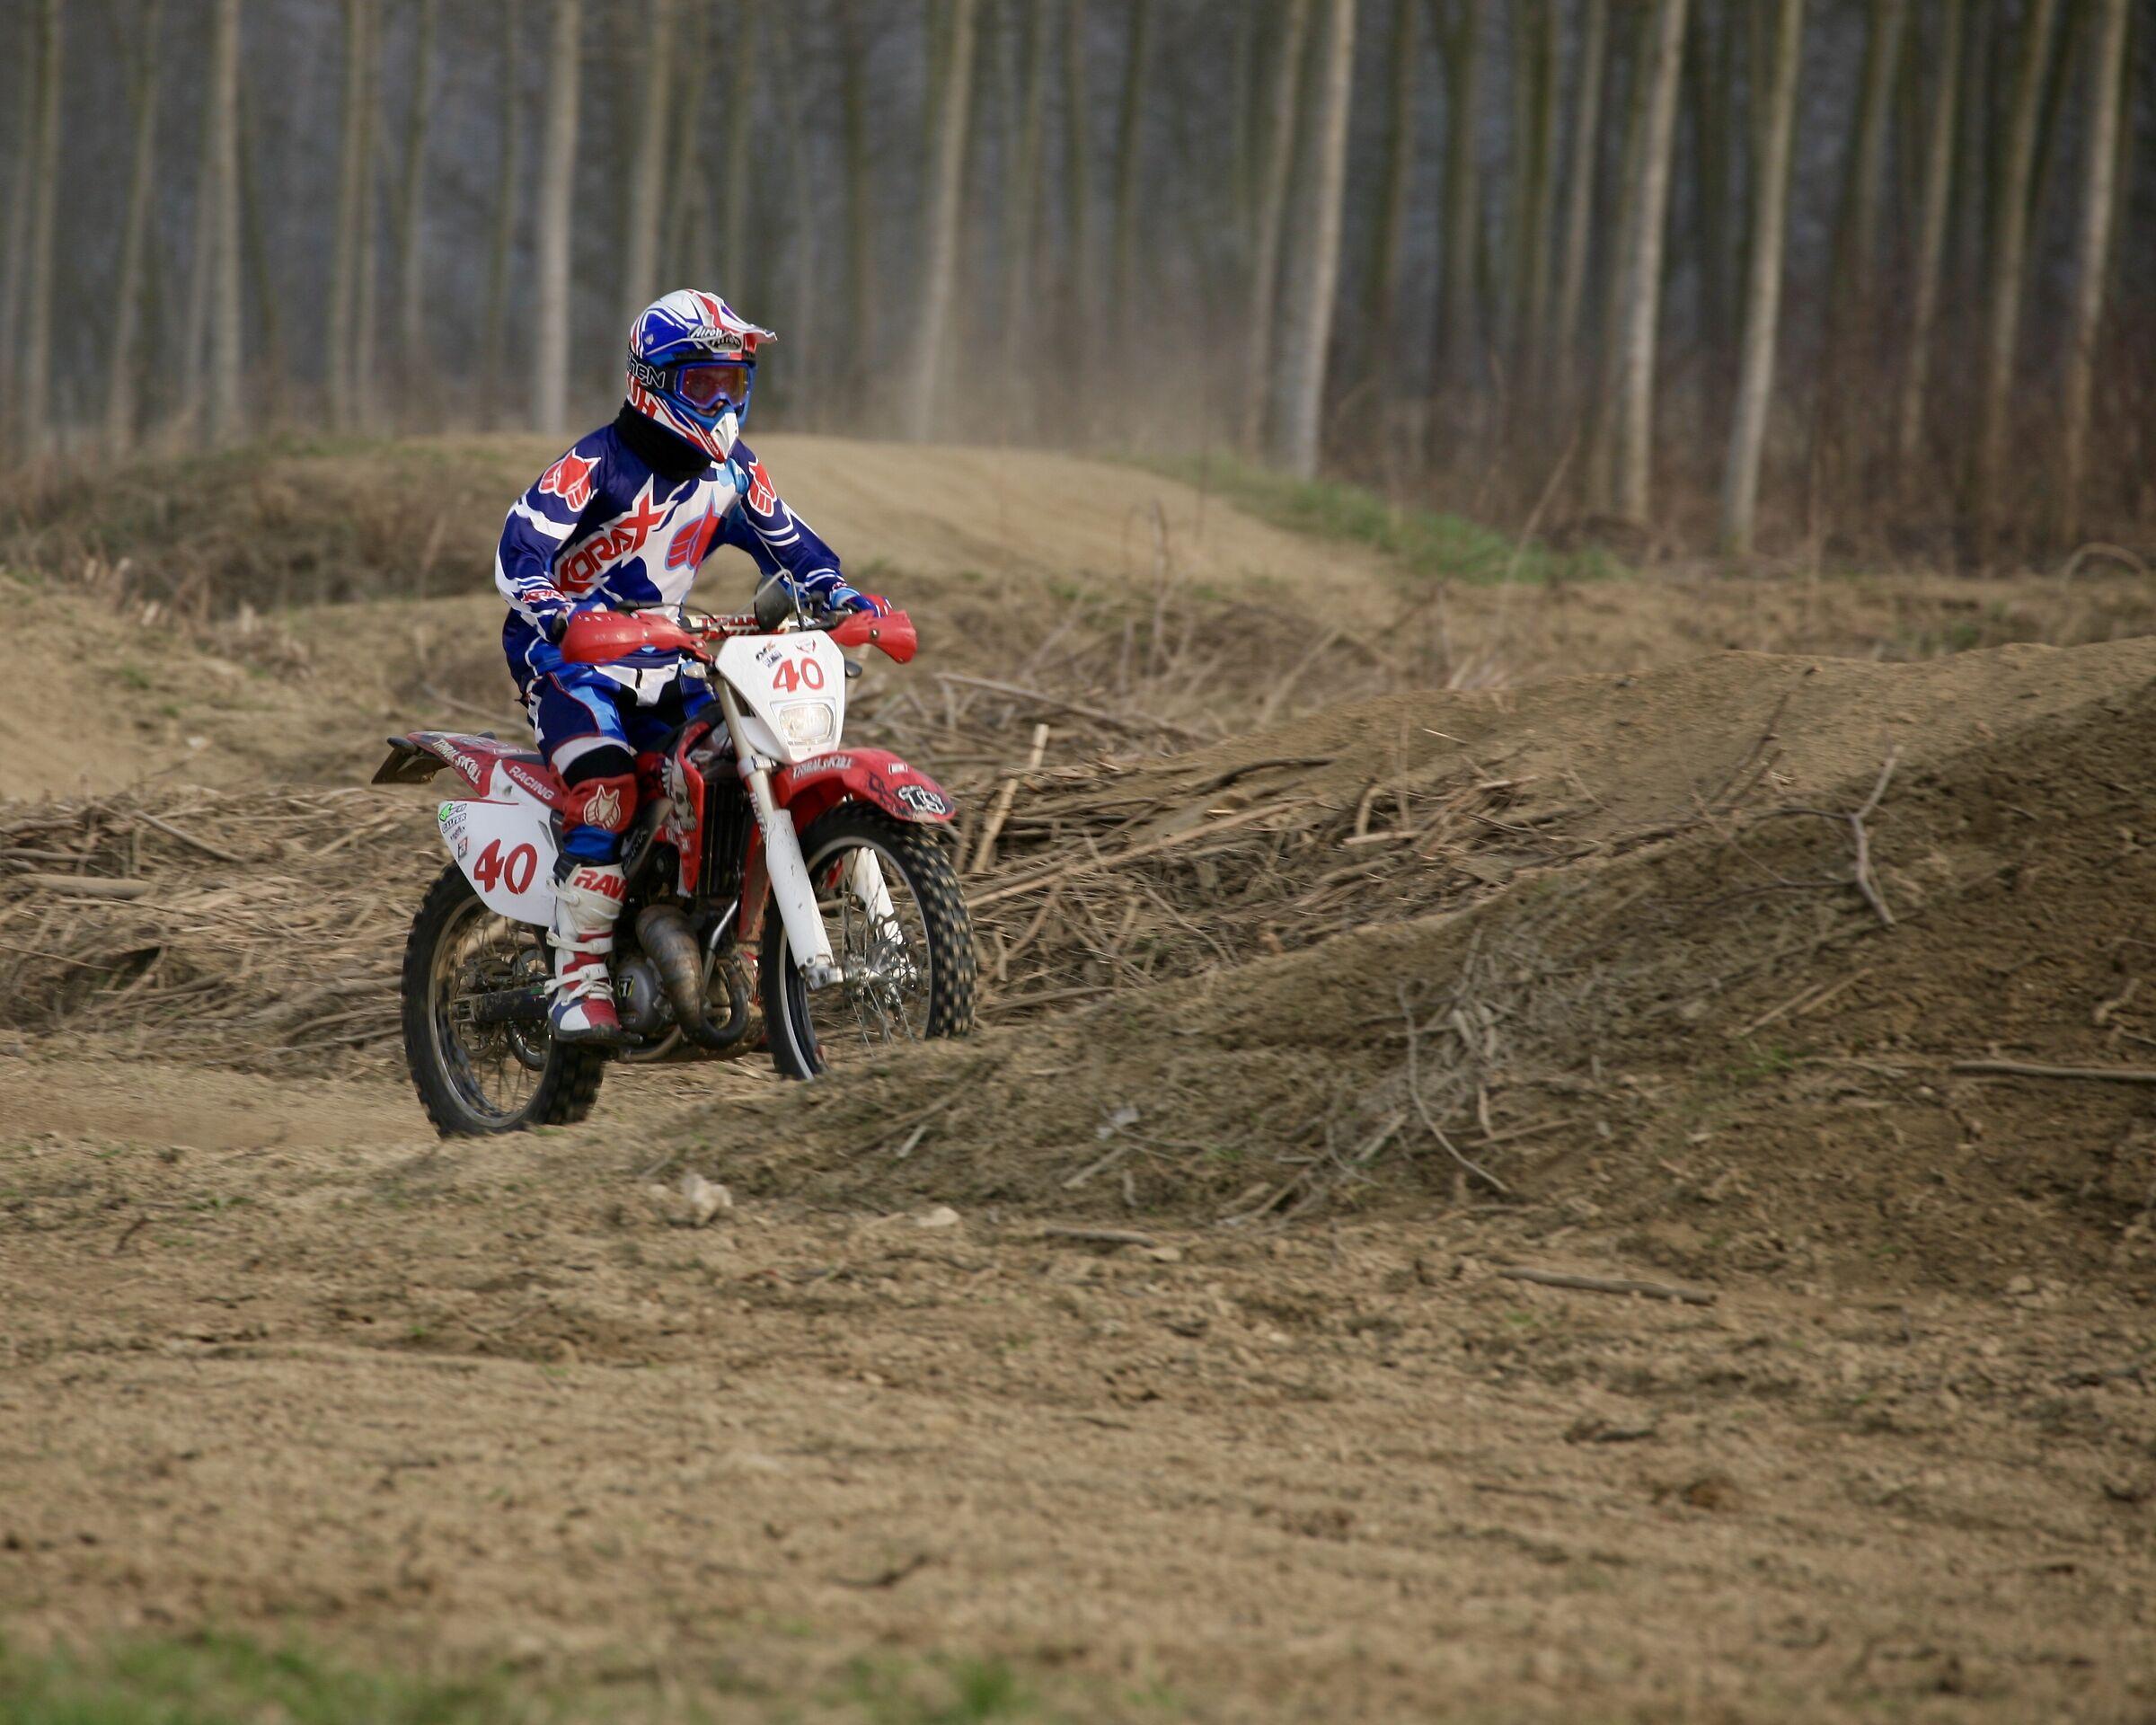 Again Luca, Alberto's son. Motocrossers. ...